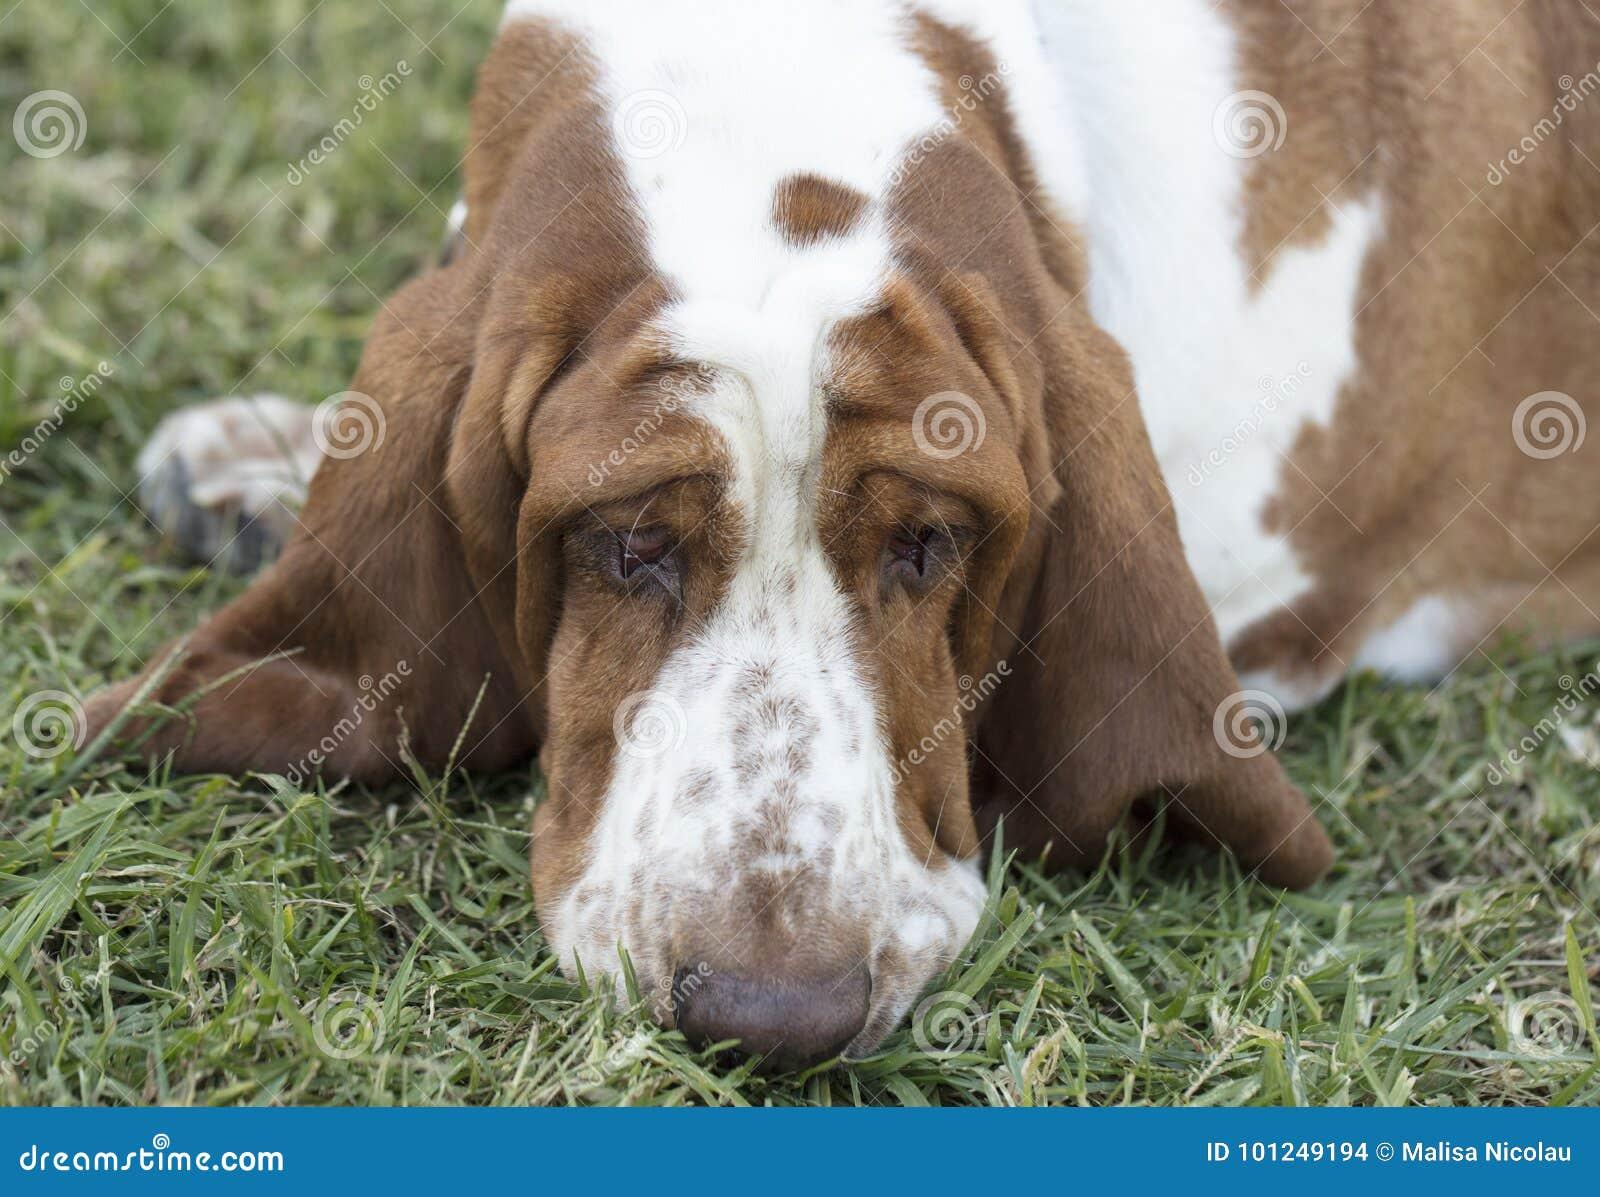 Bruine en Witte bevlekte Basset Hound-Hond